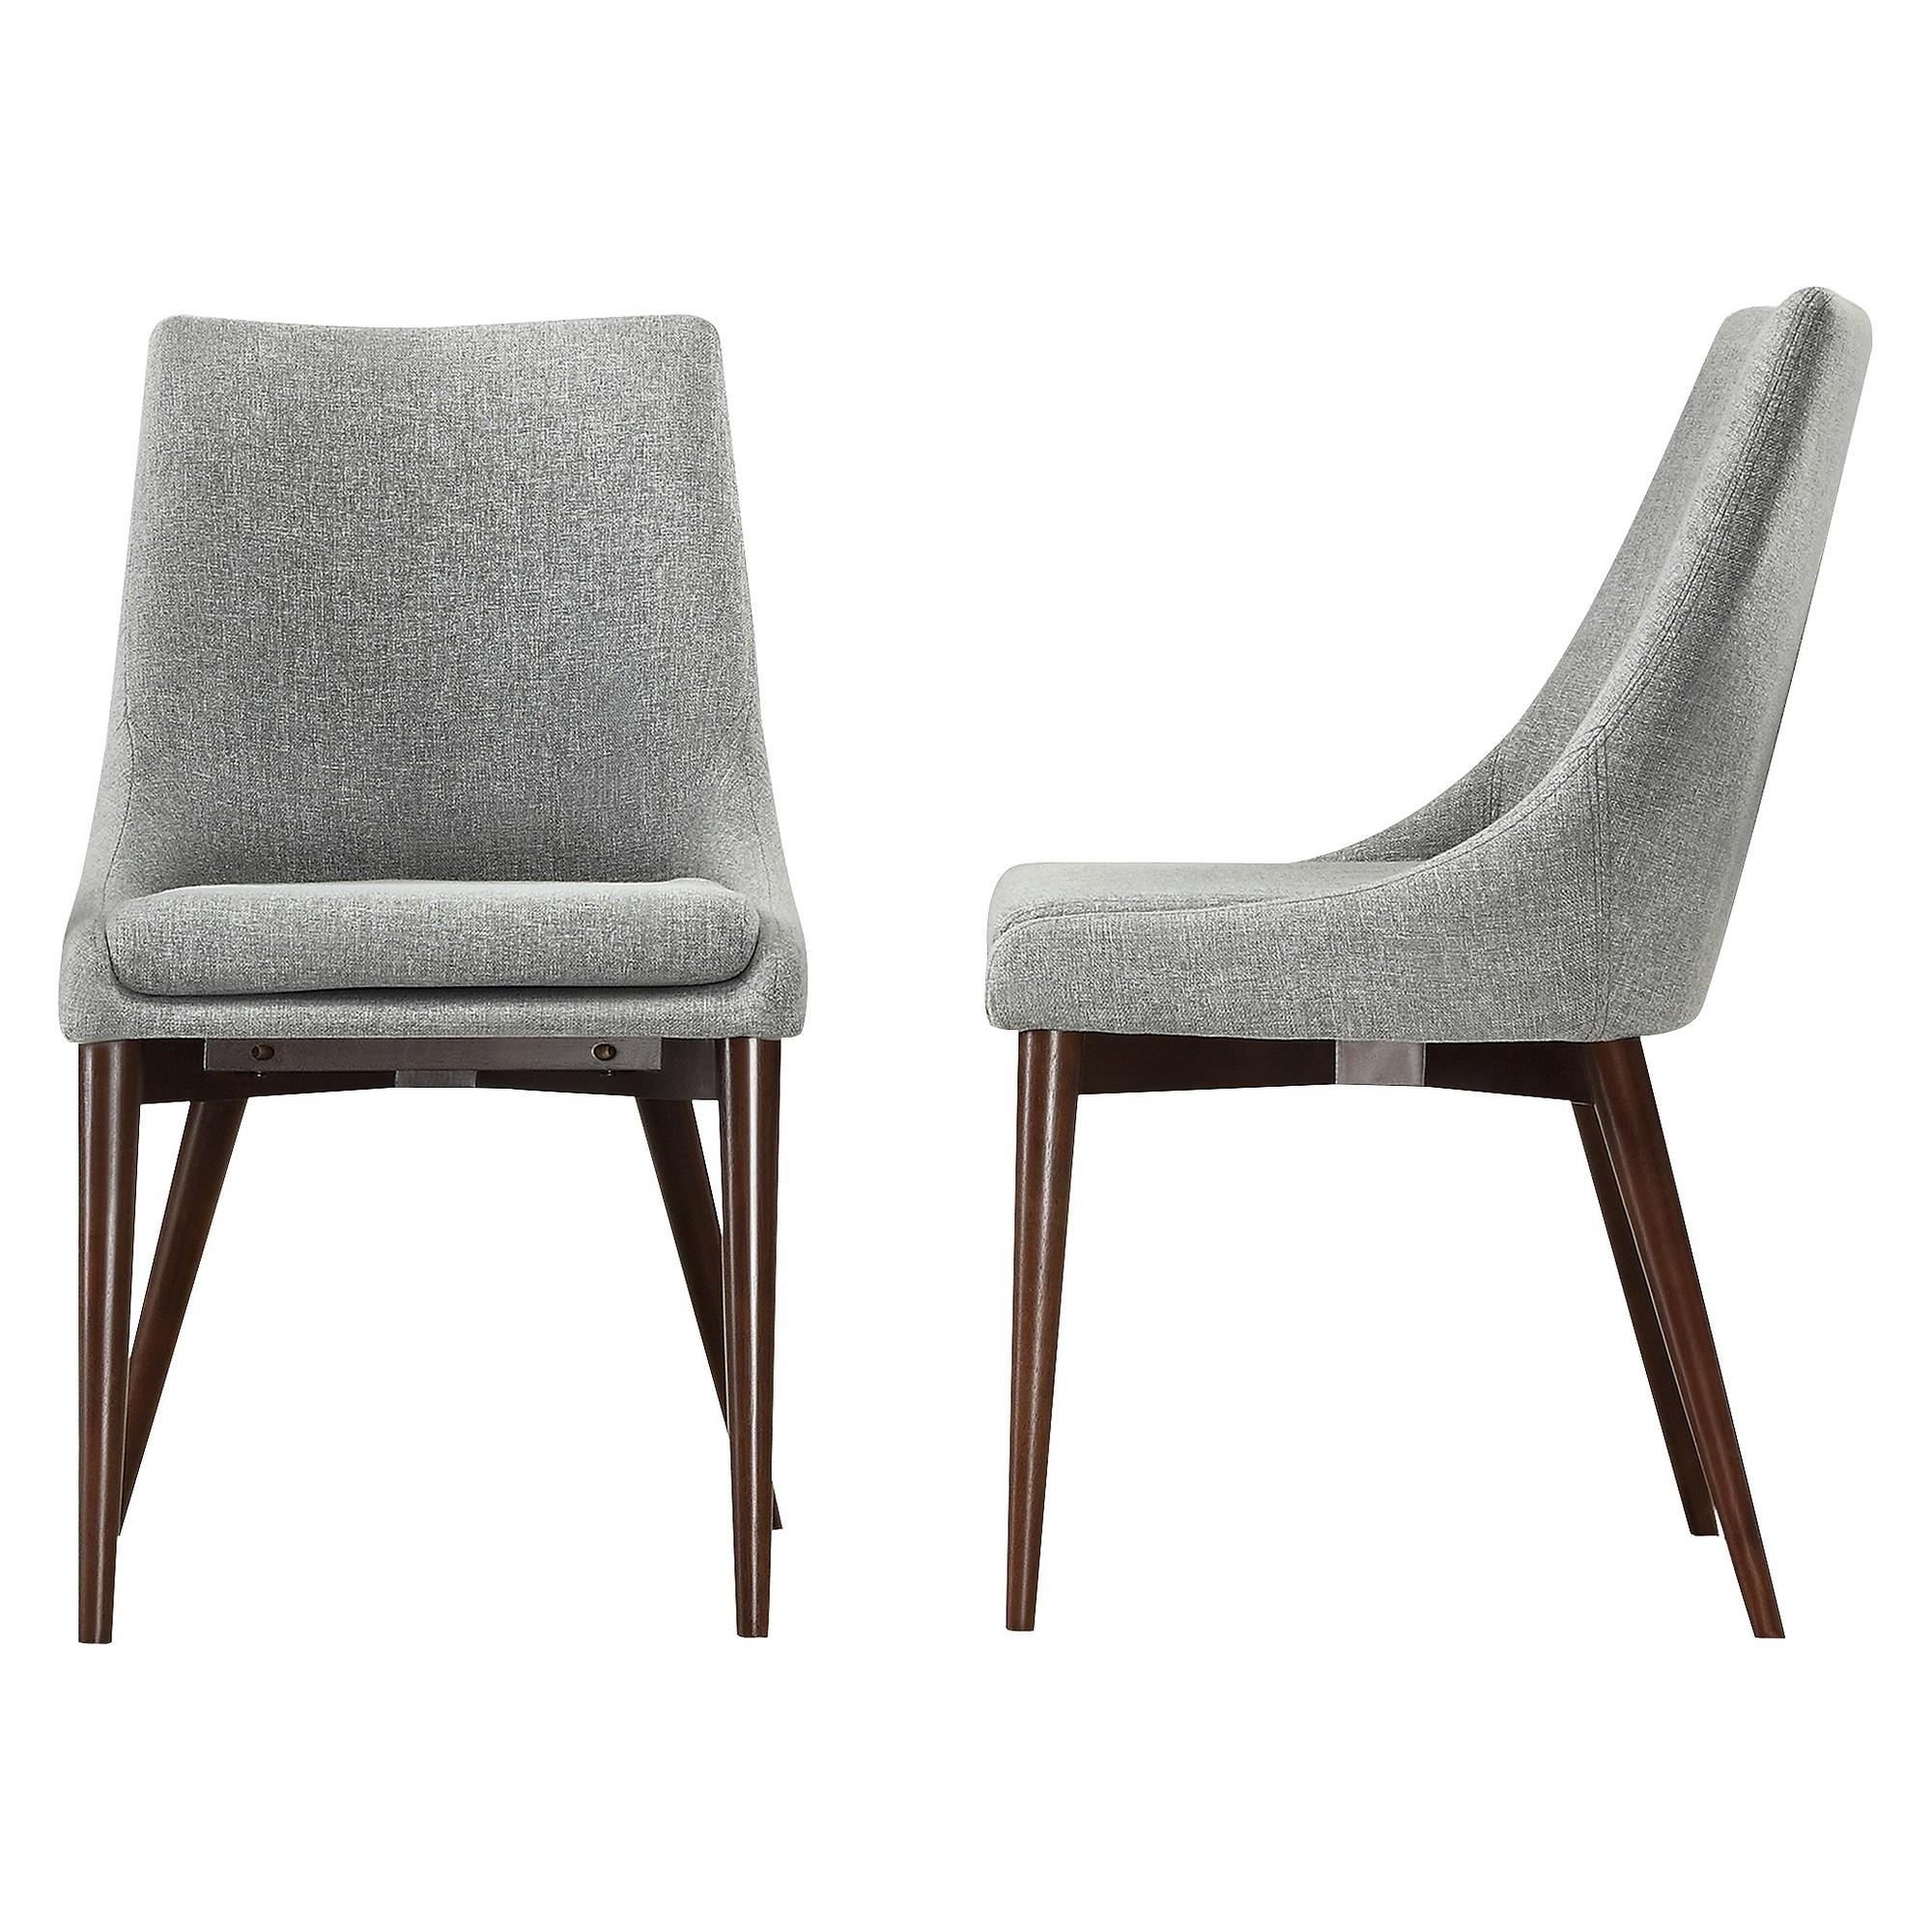 Target Dining Room Furniture: Sullivan Mid Century Dining Chair Wood/Gray (Set Of 2